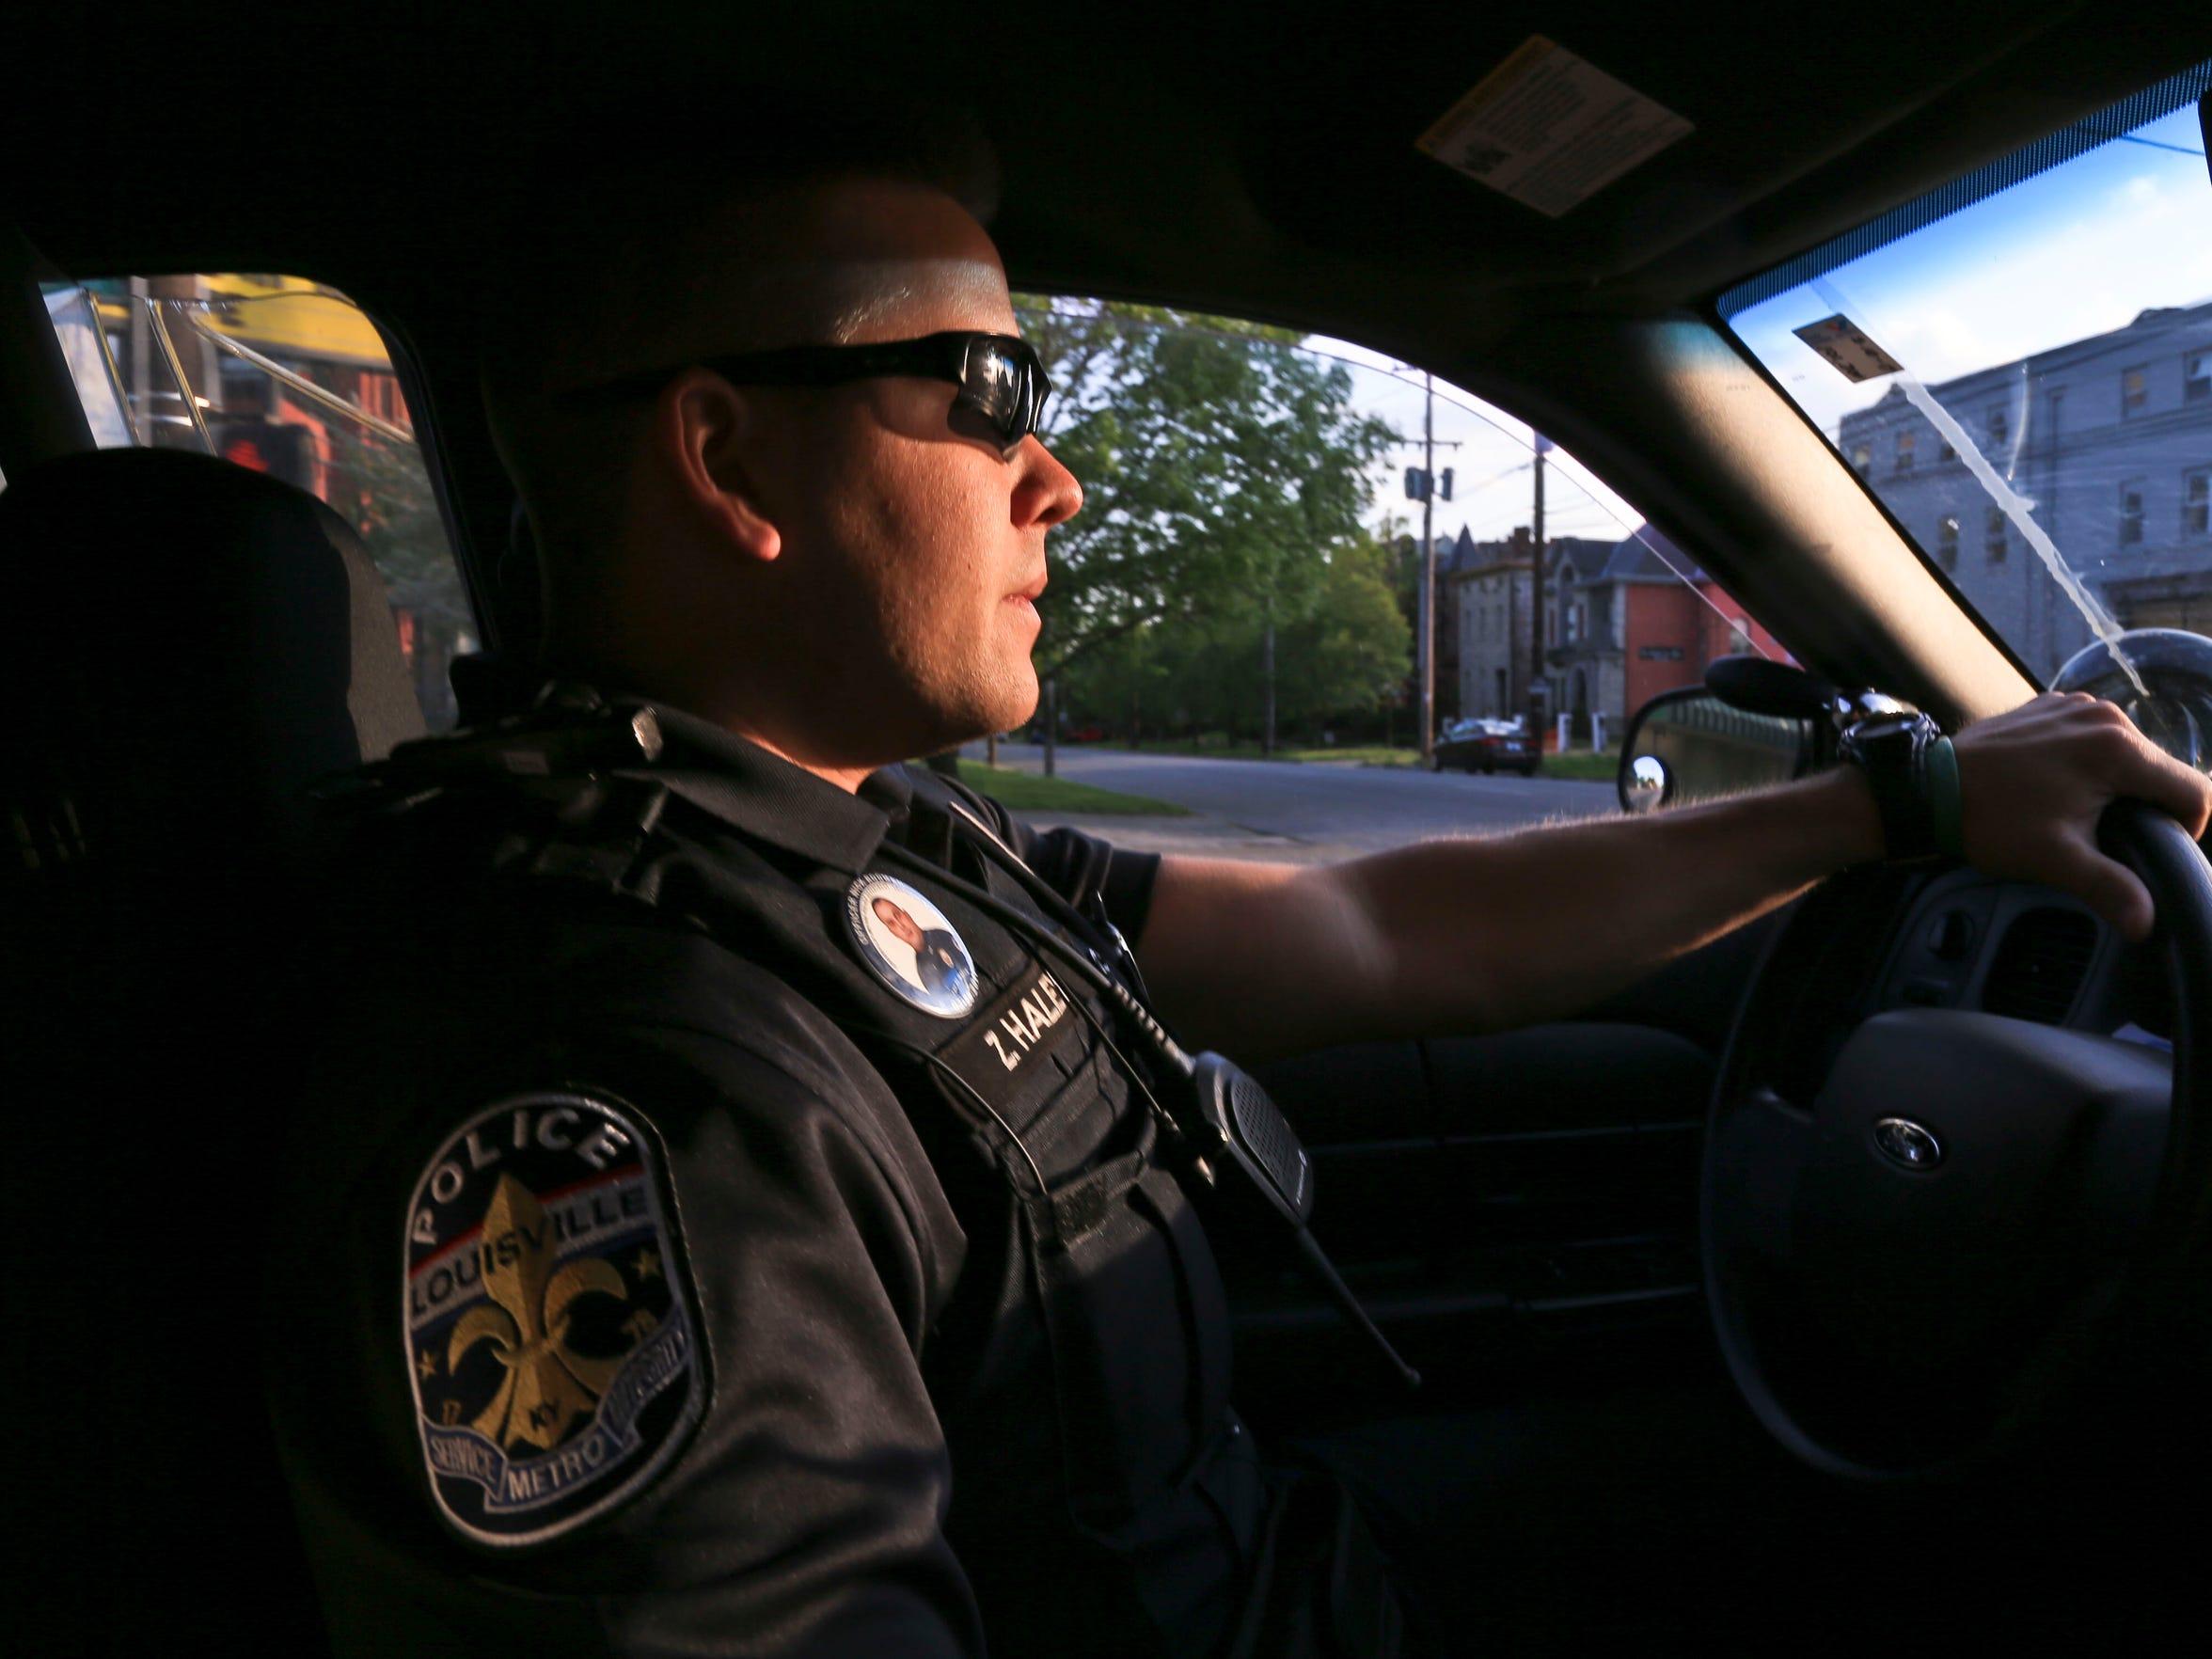 LMPD officer Zack Haley cruises through Old Louisville